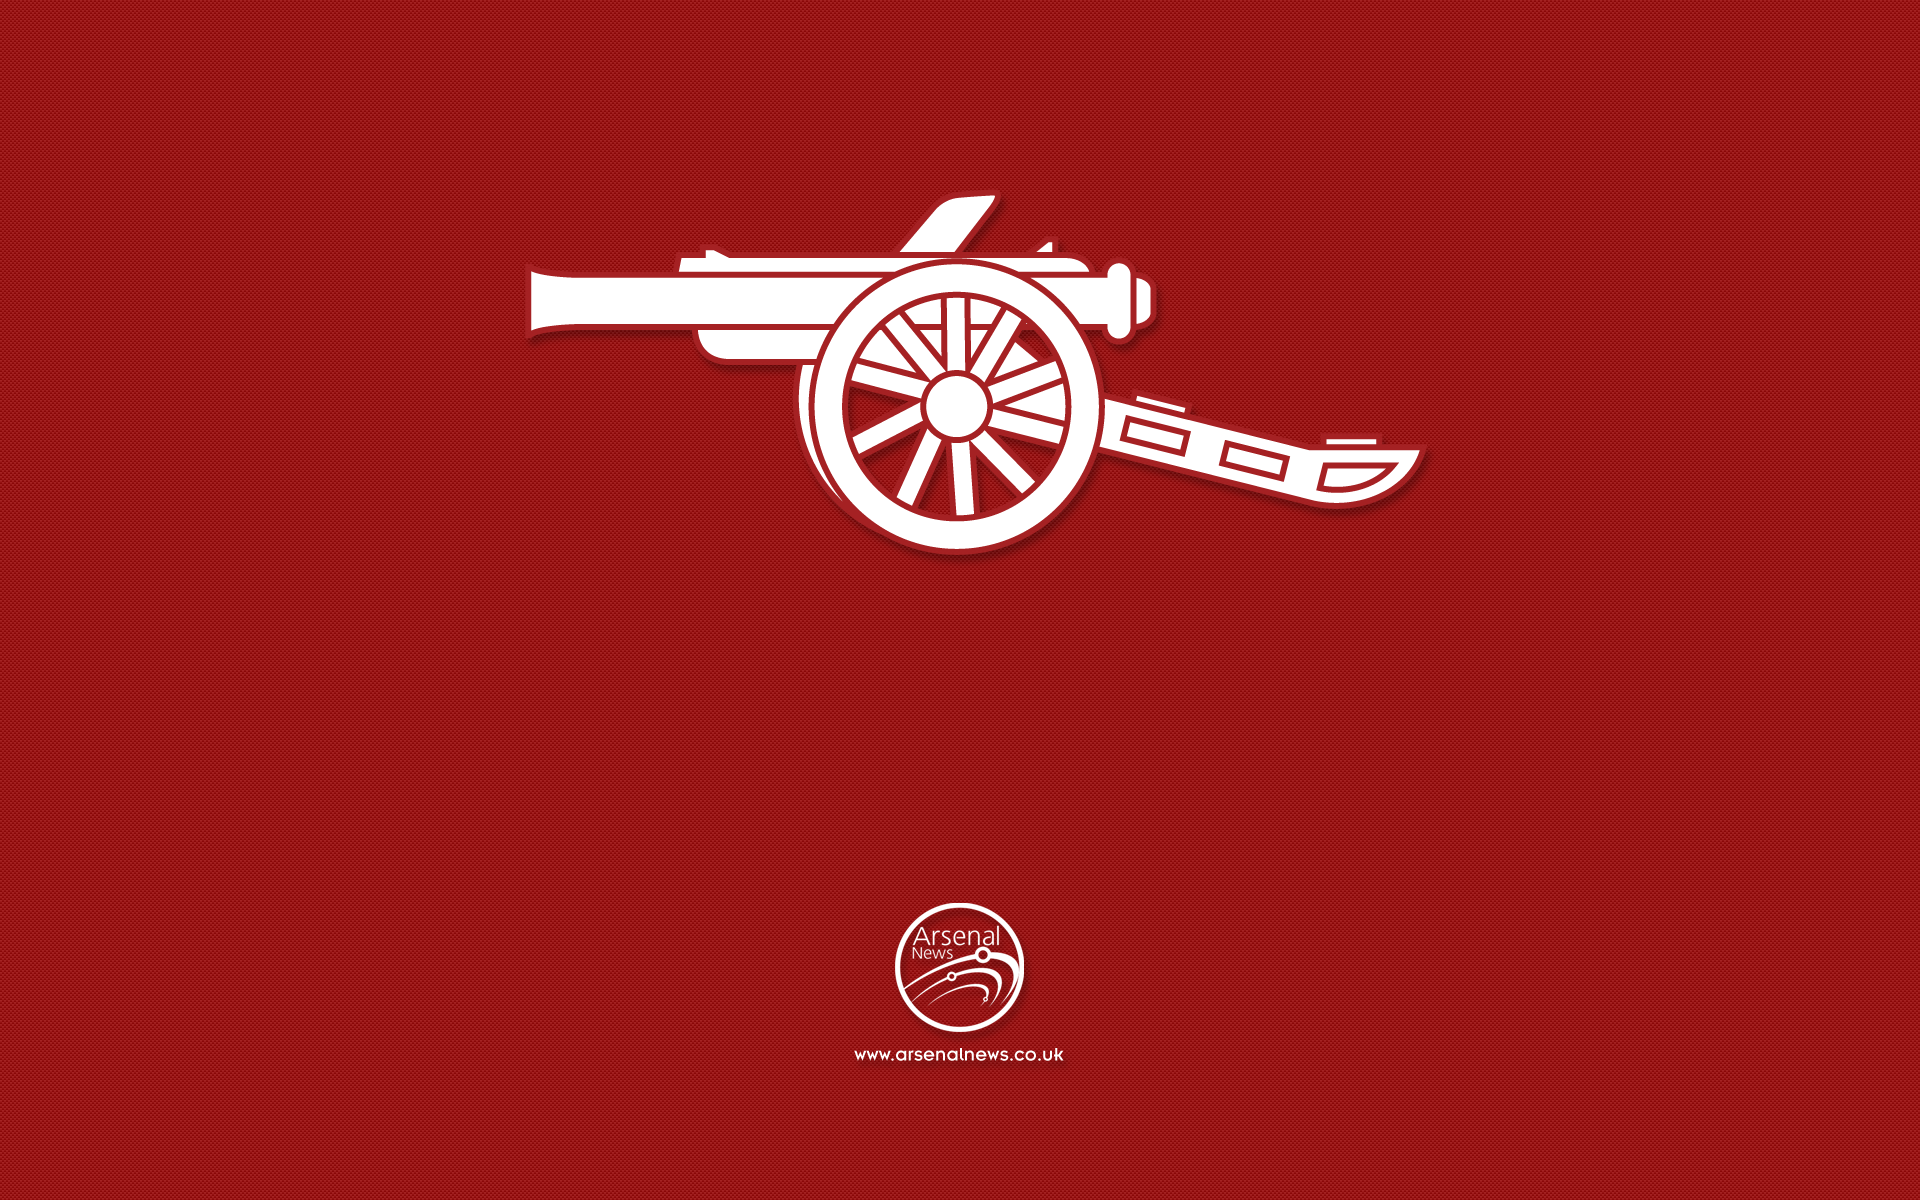 Old Arsenal Badge Wallpaper Hd Football In 2020 Arsenal Wallpapers Arsenal Arsenal Tattoo